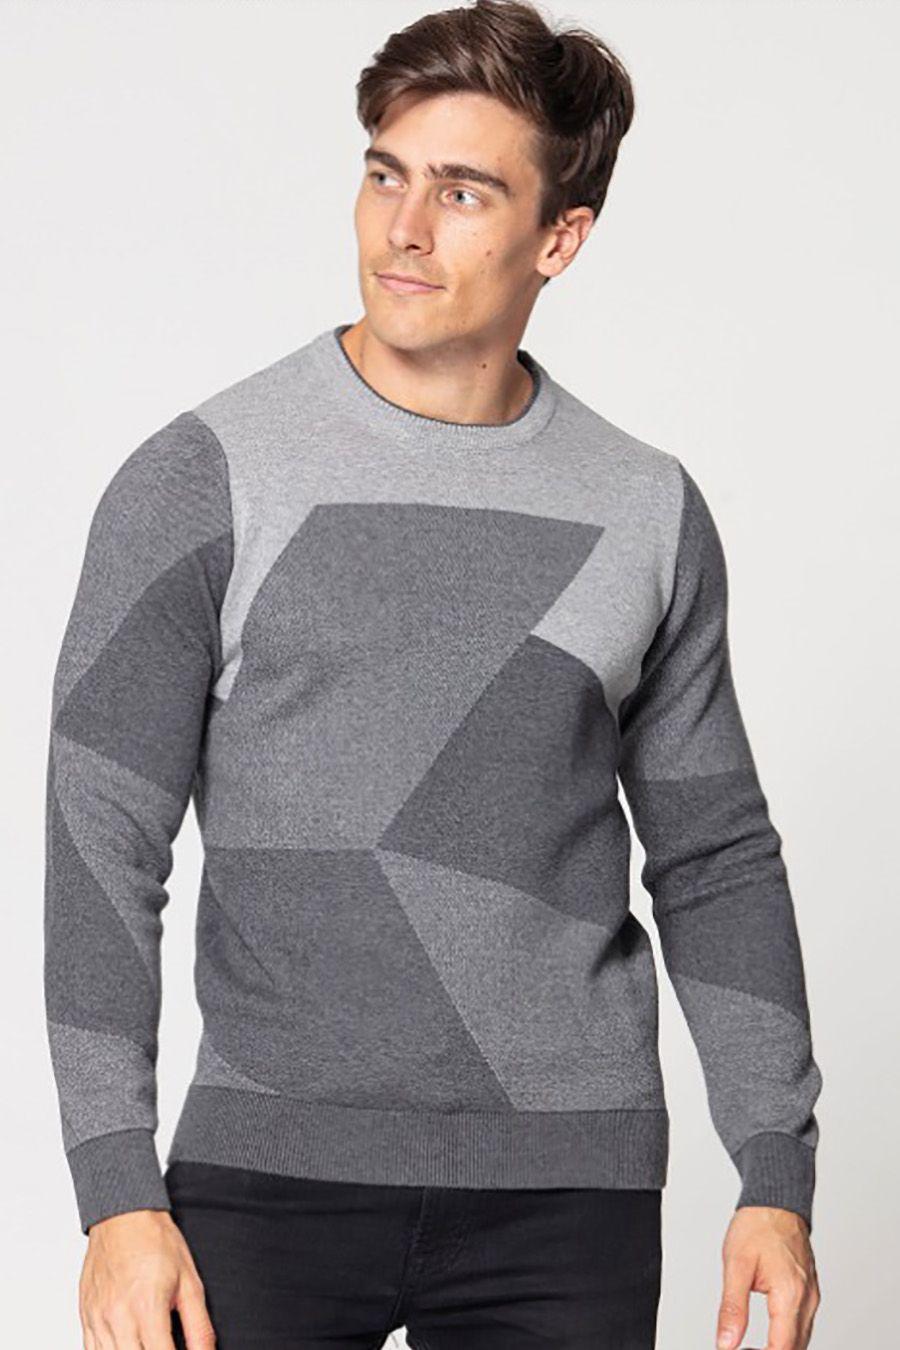 Джемпер (свитер) мужской Pooll Park 201432 Grey - фото 1